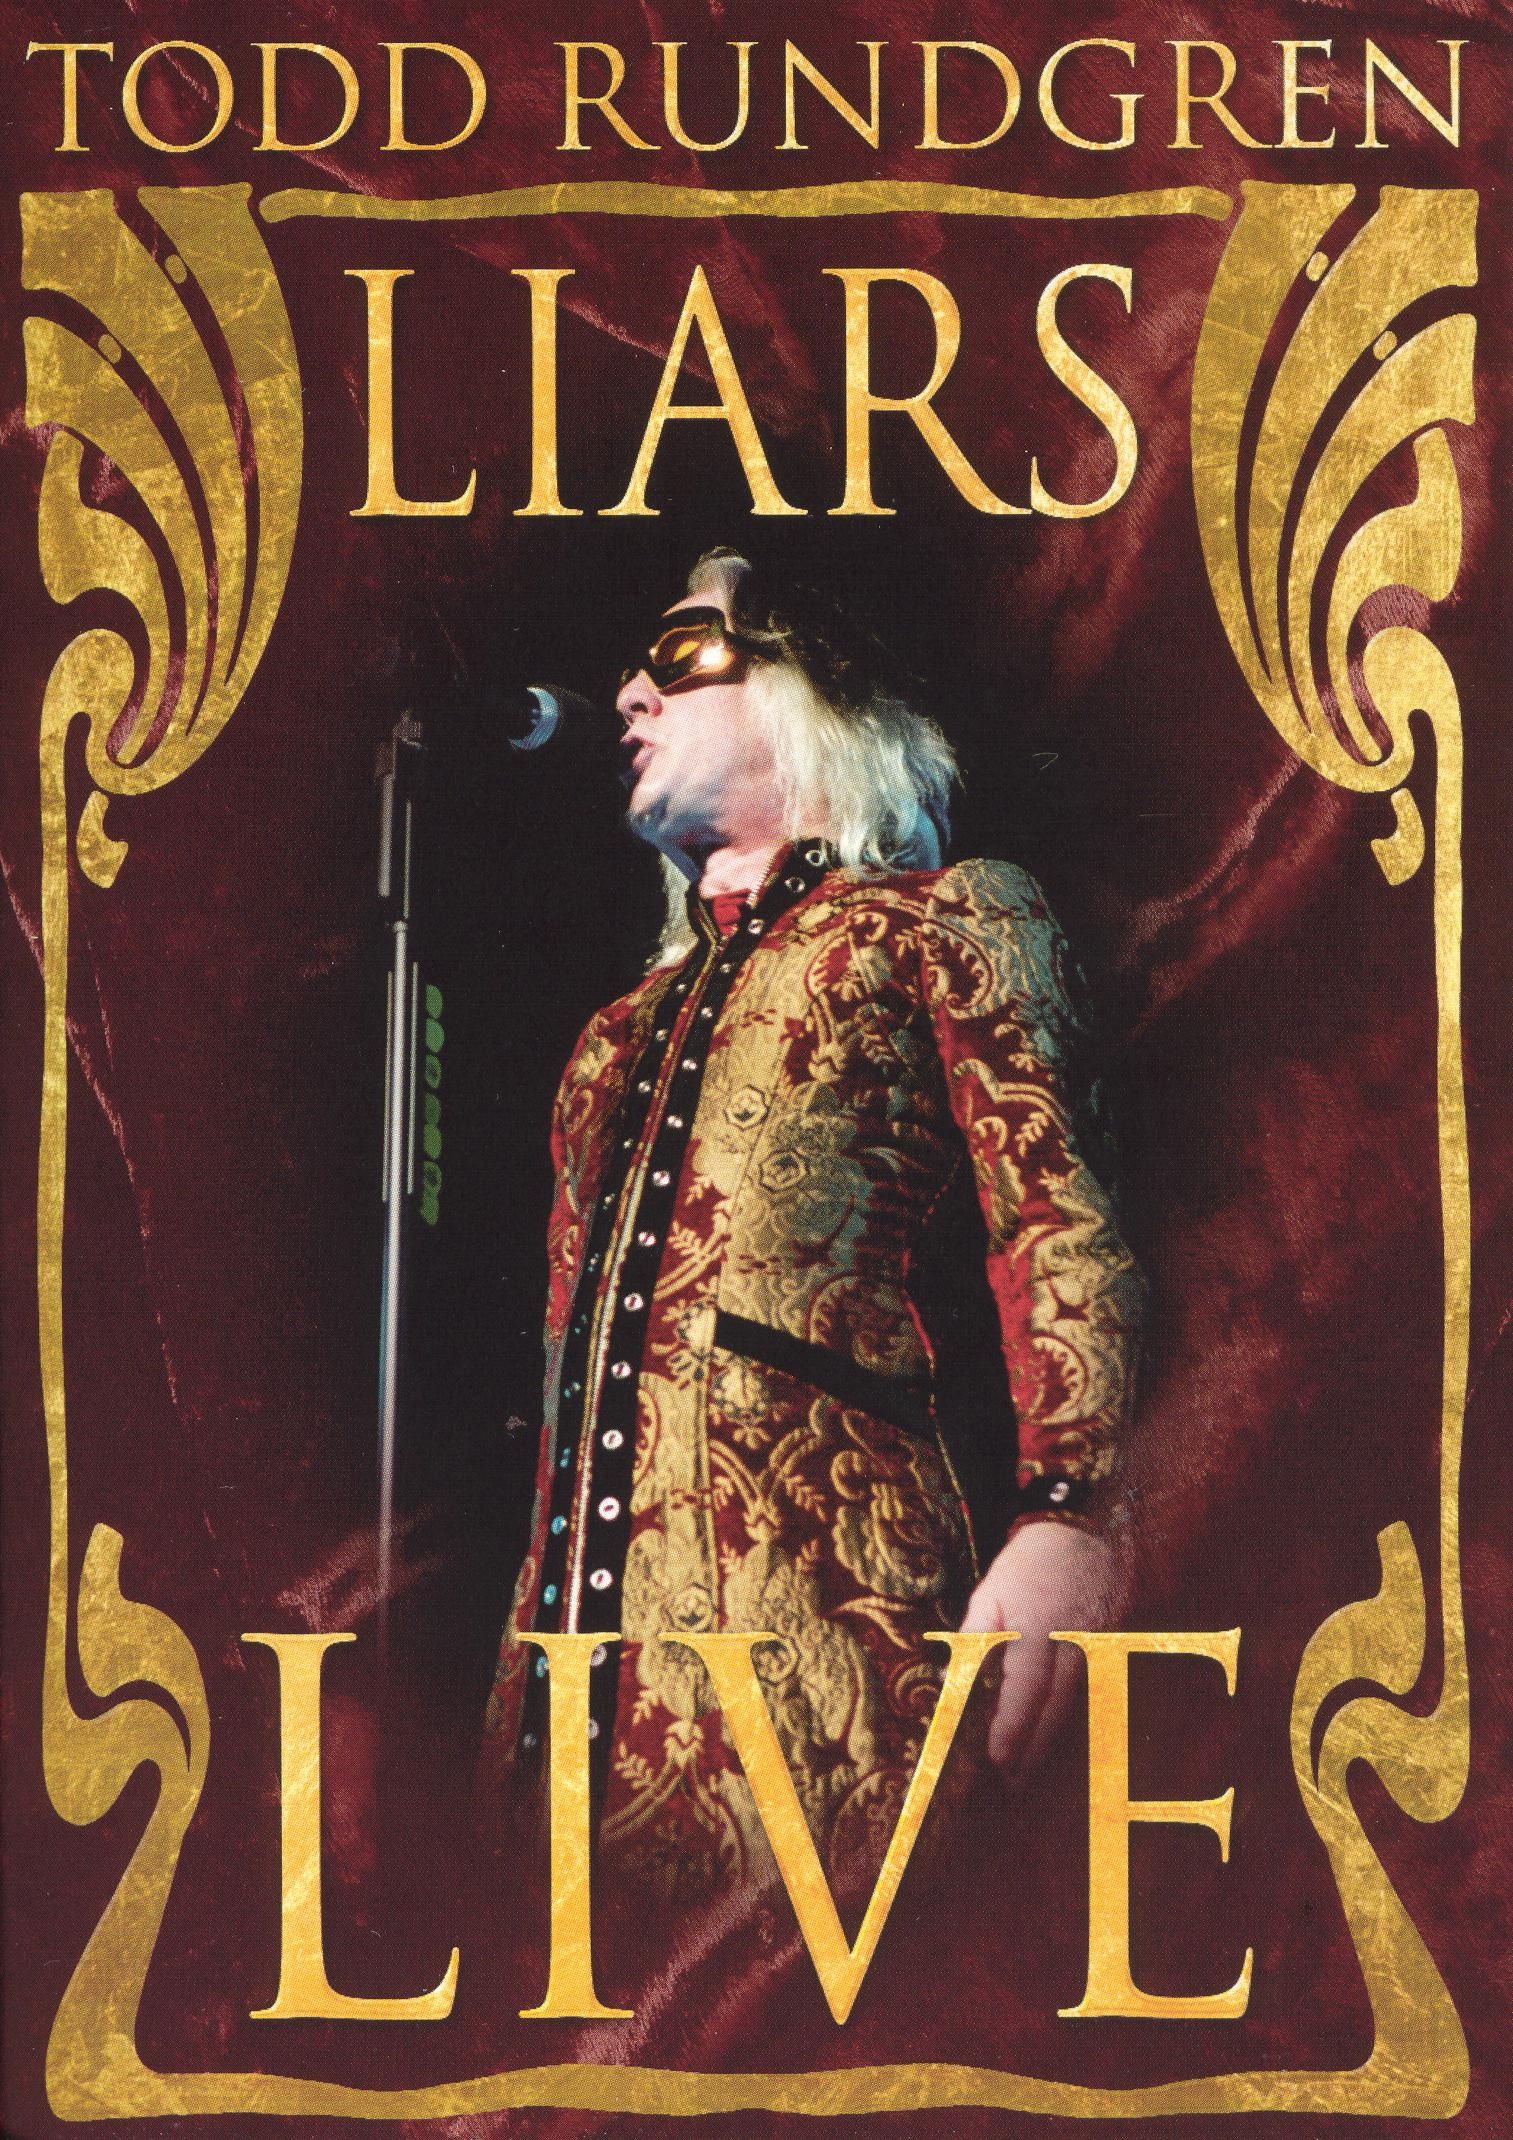 Todd Rundgren: Liars Live